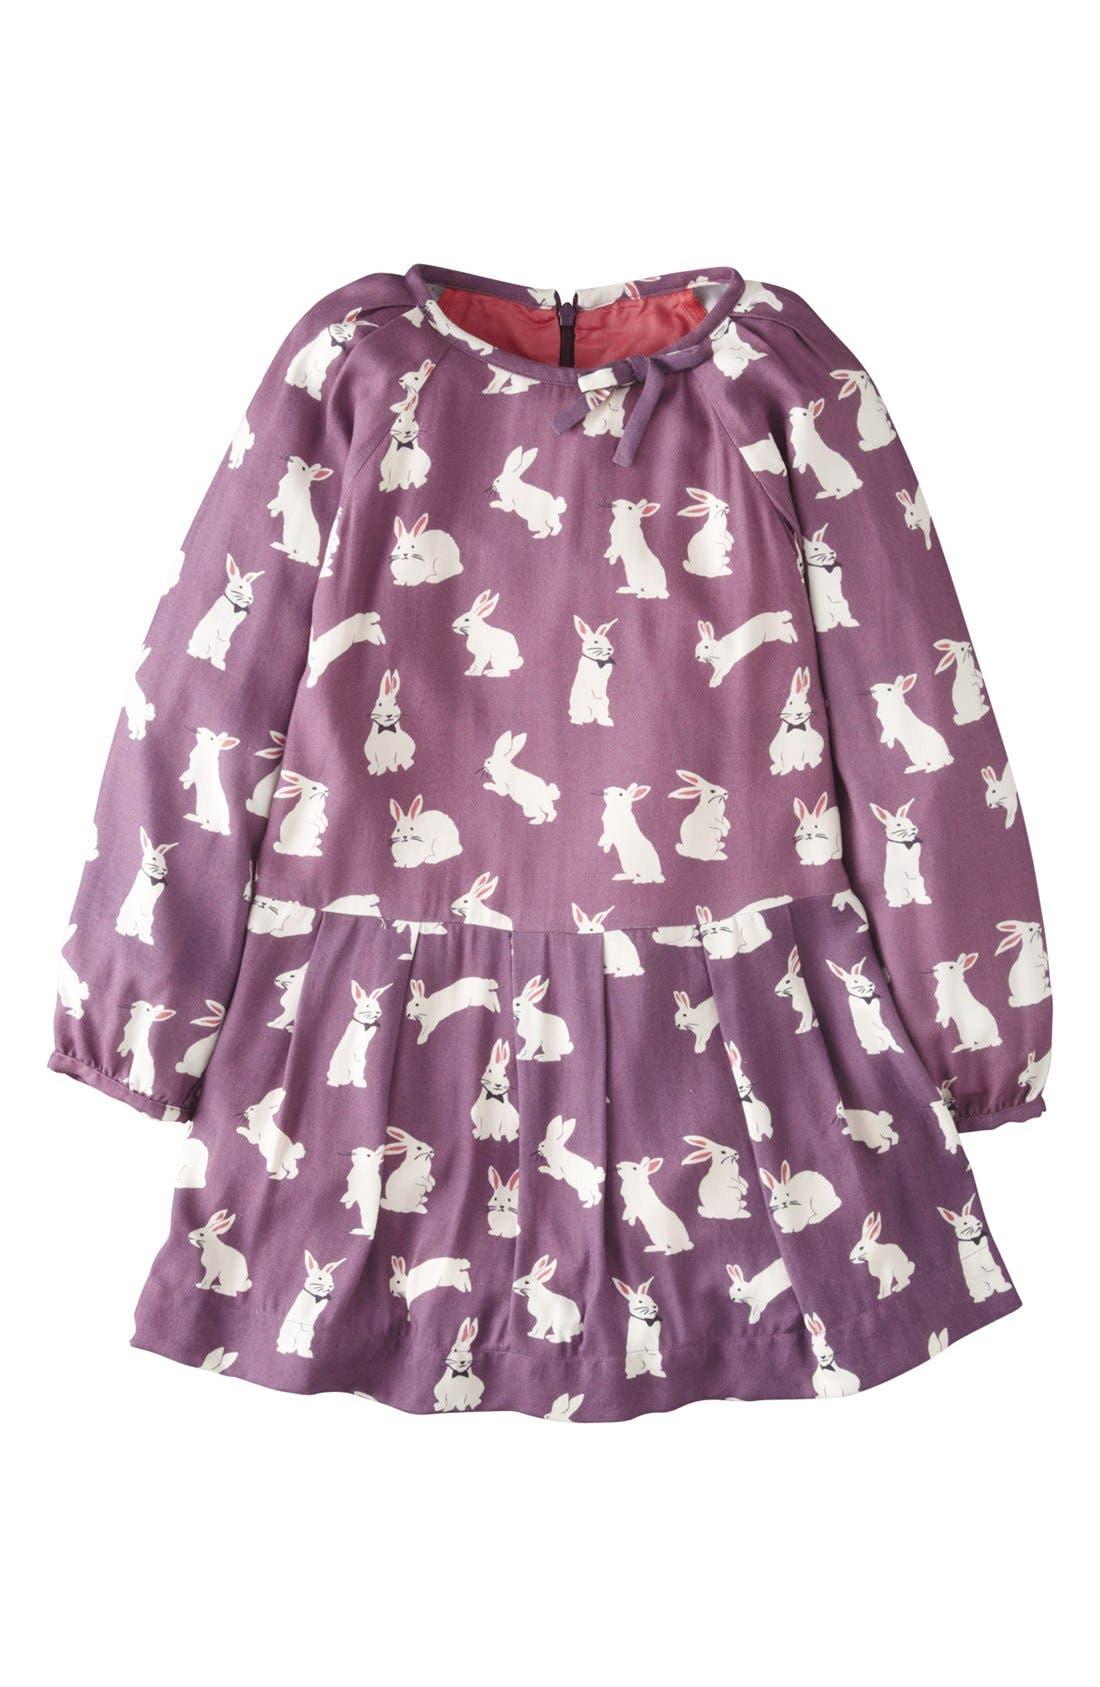 Alternate Image 1 Selected - Mini Boden 'Twenties' Long Sleeve Dress (Little Girls & Big Girls)